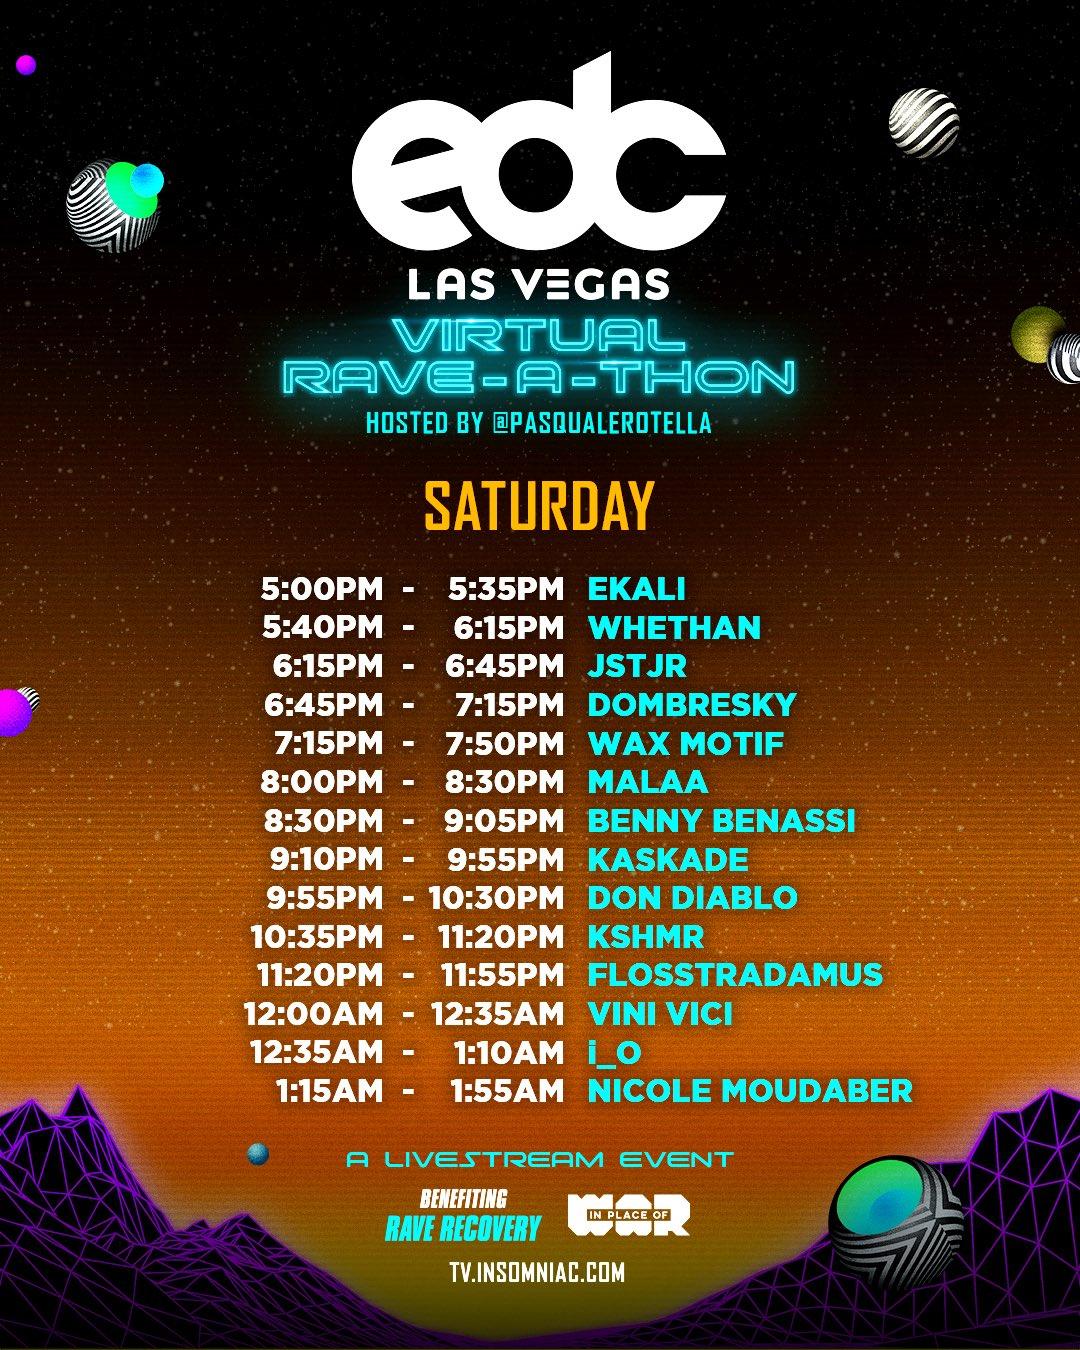 EDC Las Vegas Virtual Rave-A-Thon Schedule - Saturday